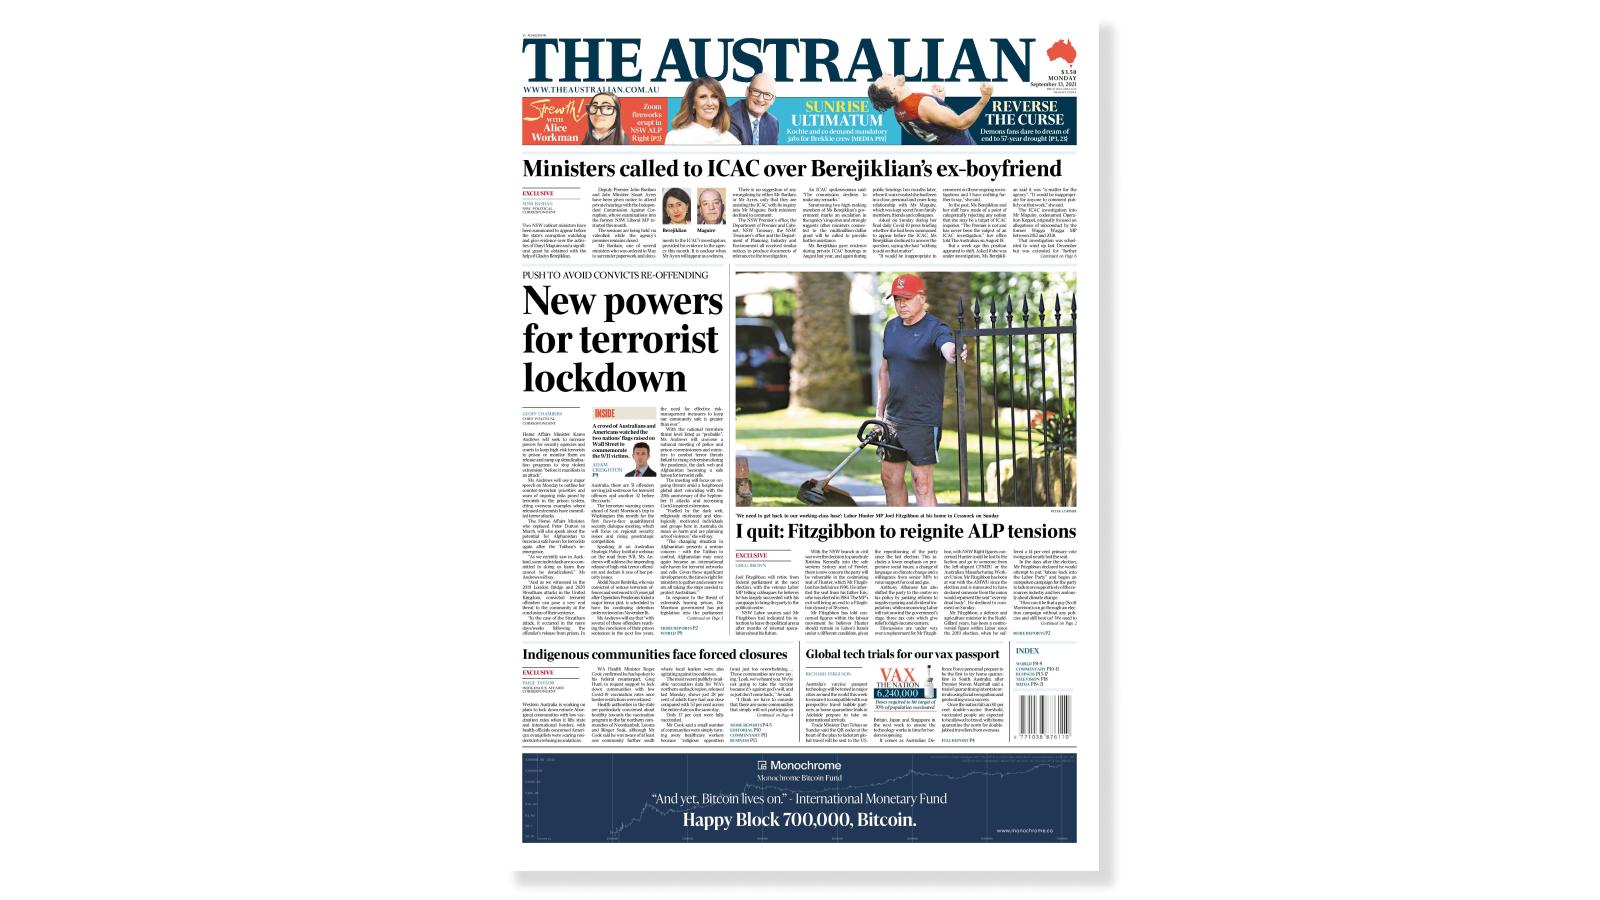 Monochrome_Bitcoin Block 700k_The Australian.png